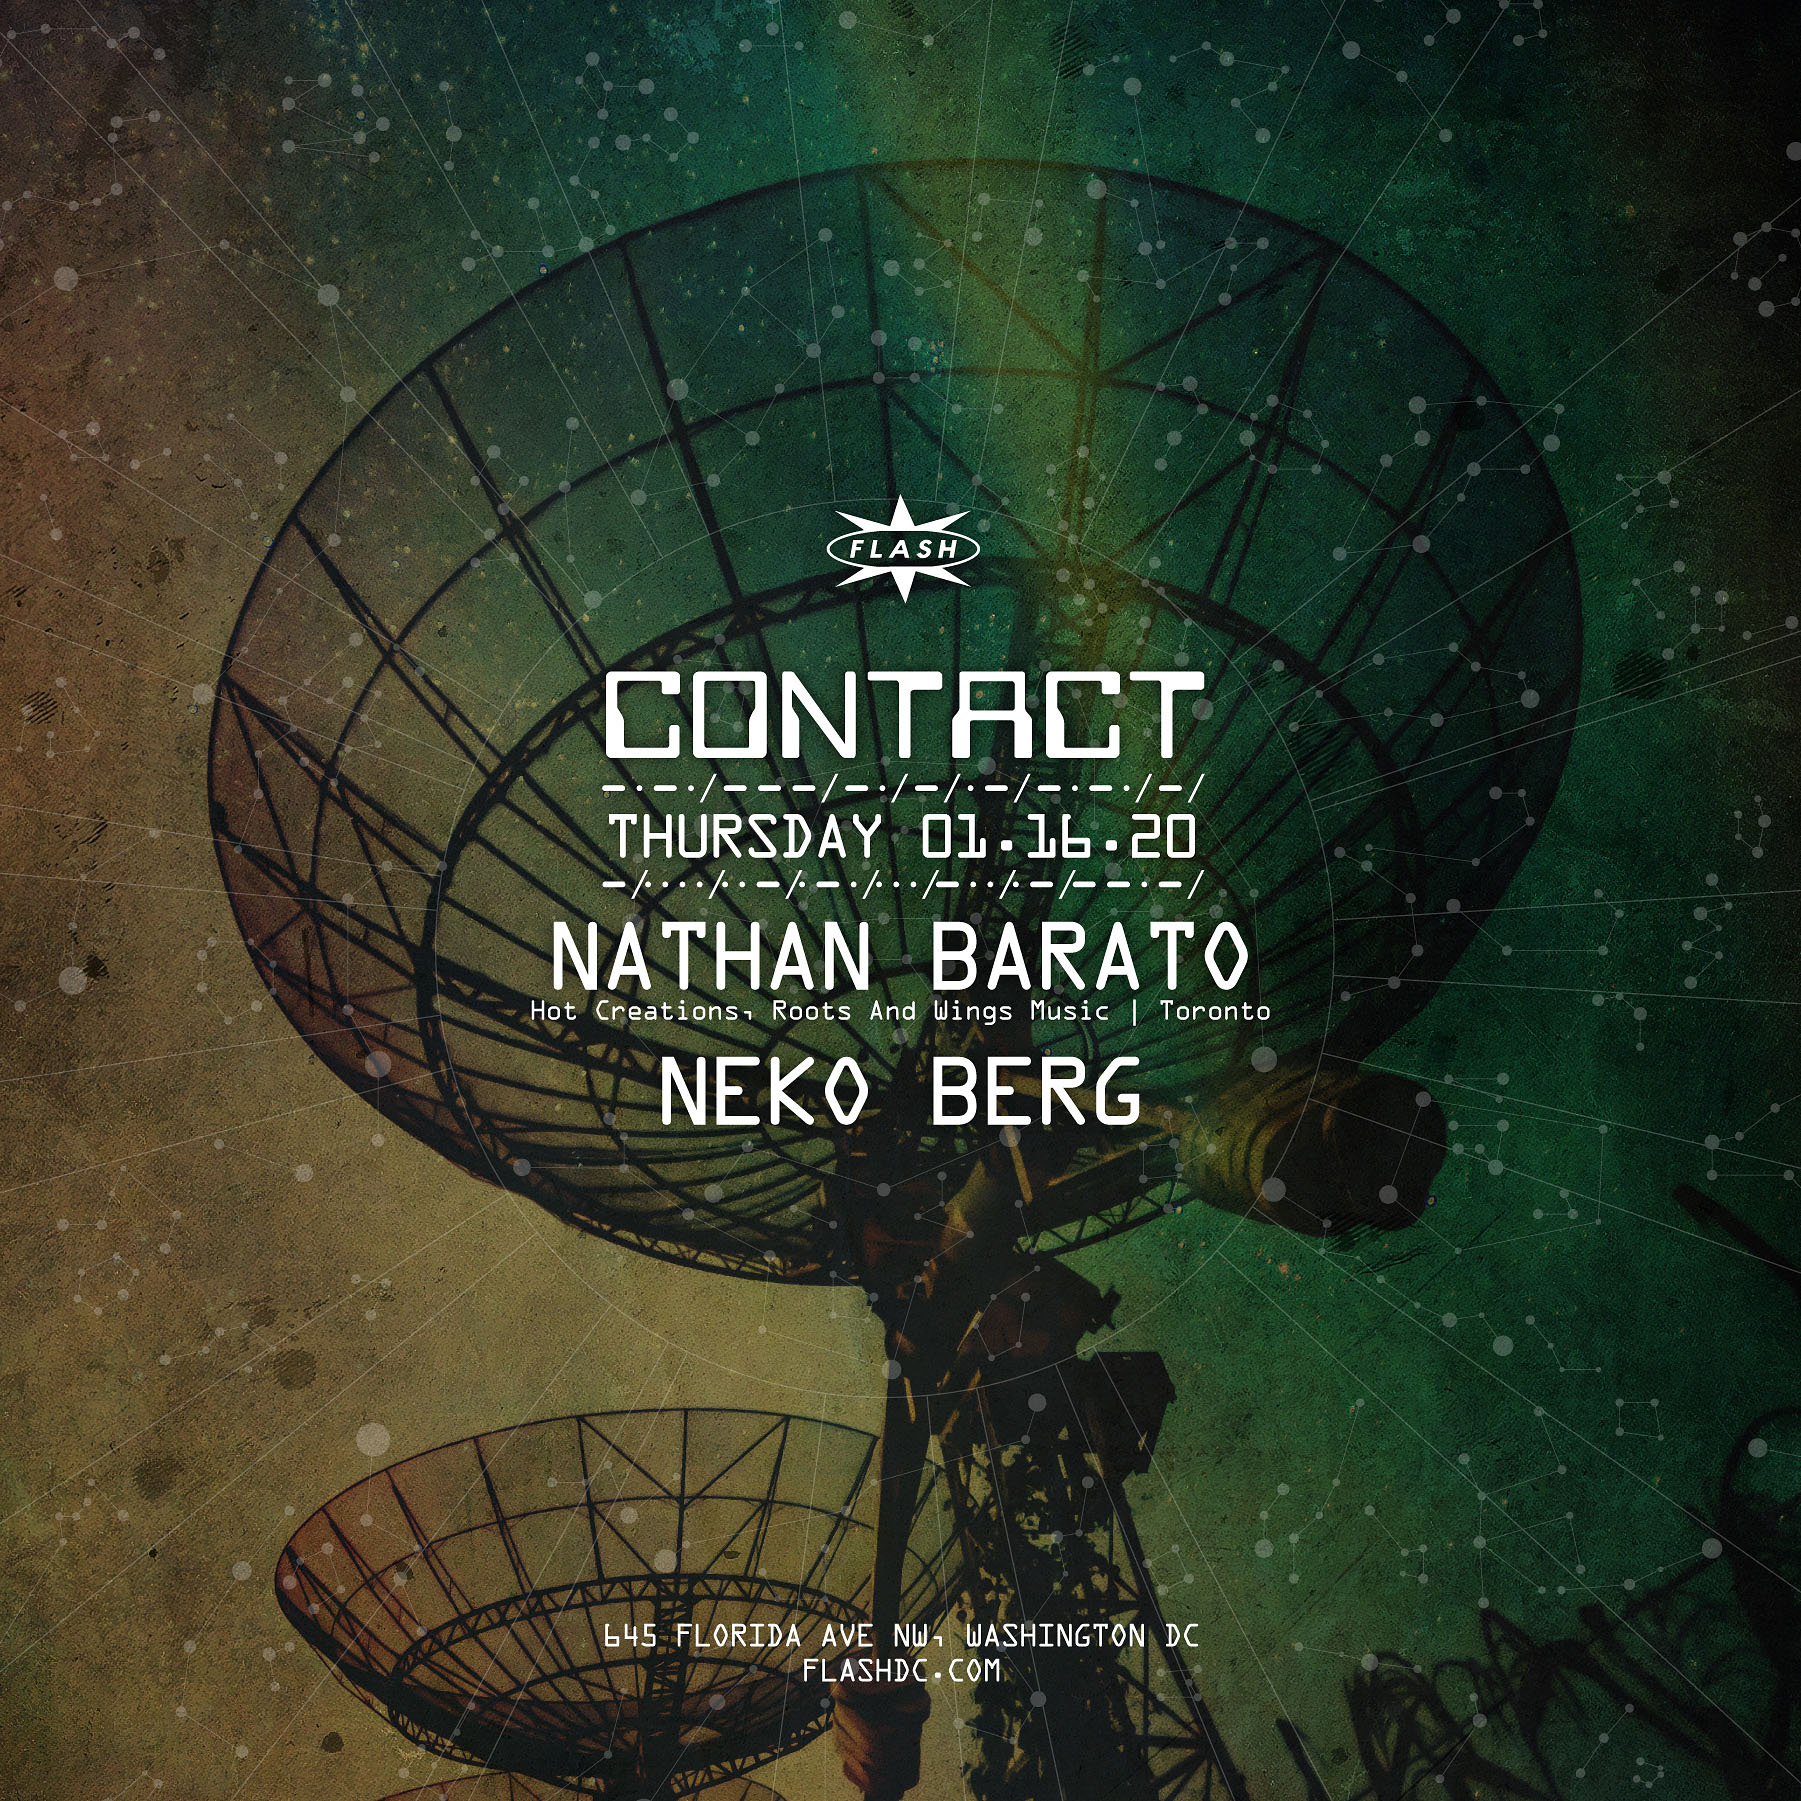 CONTACT: Nathan Barato event thumbnail